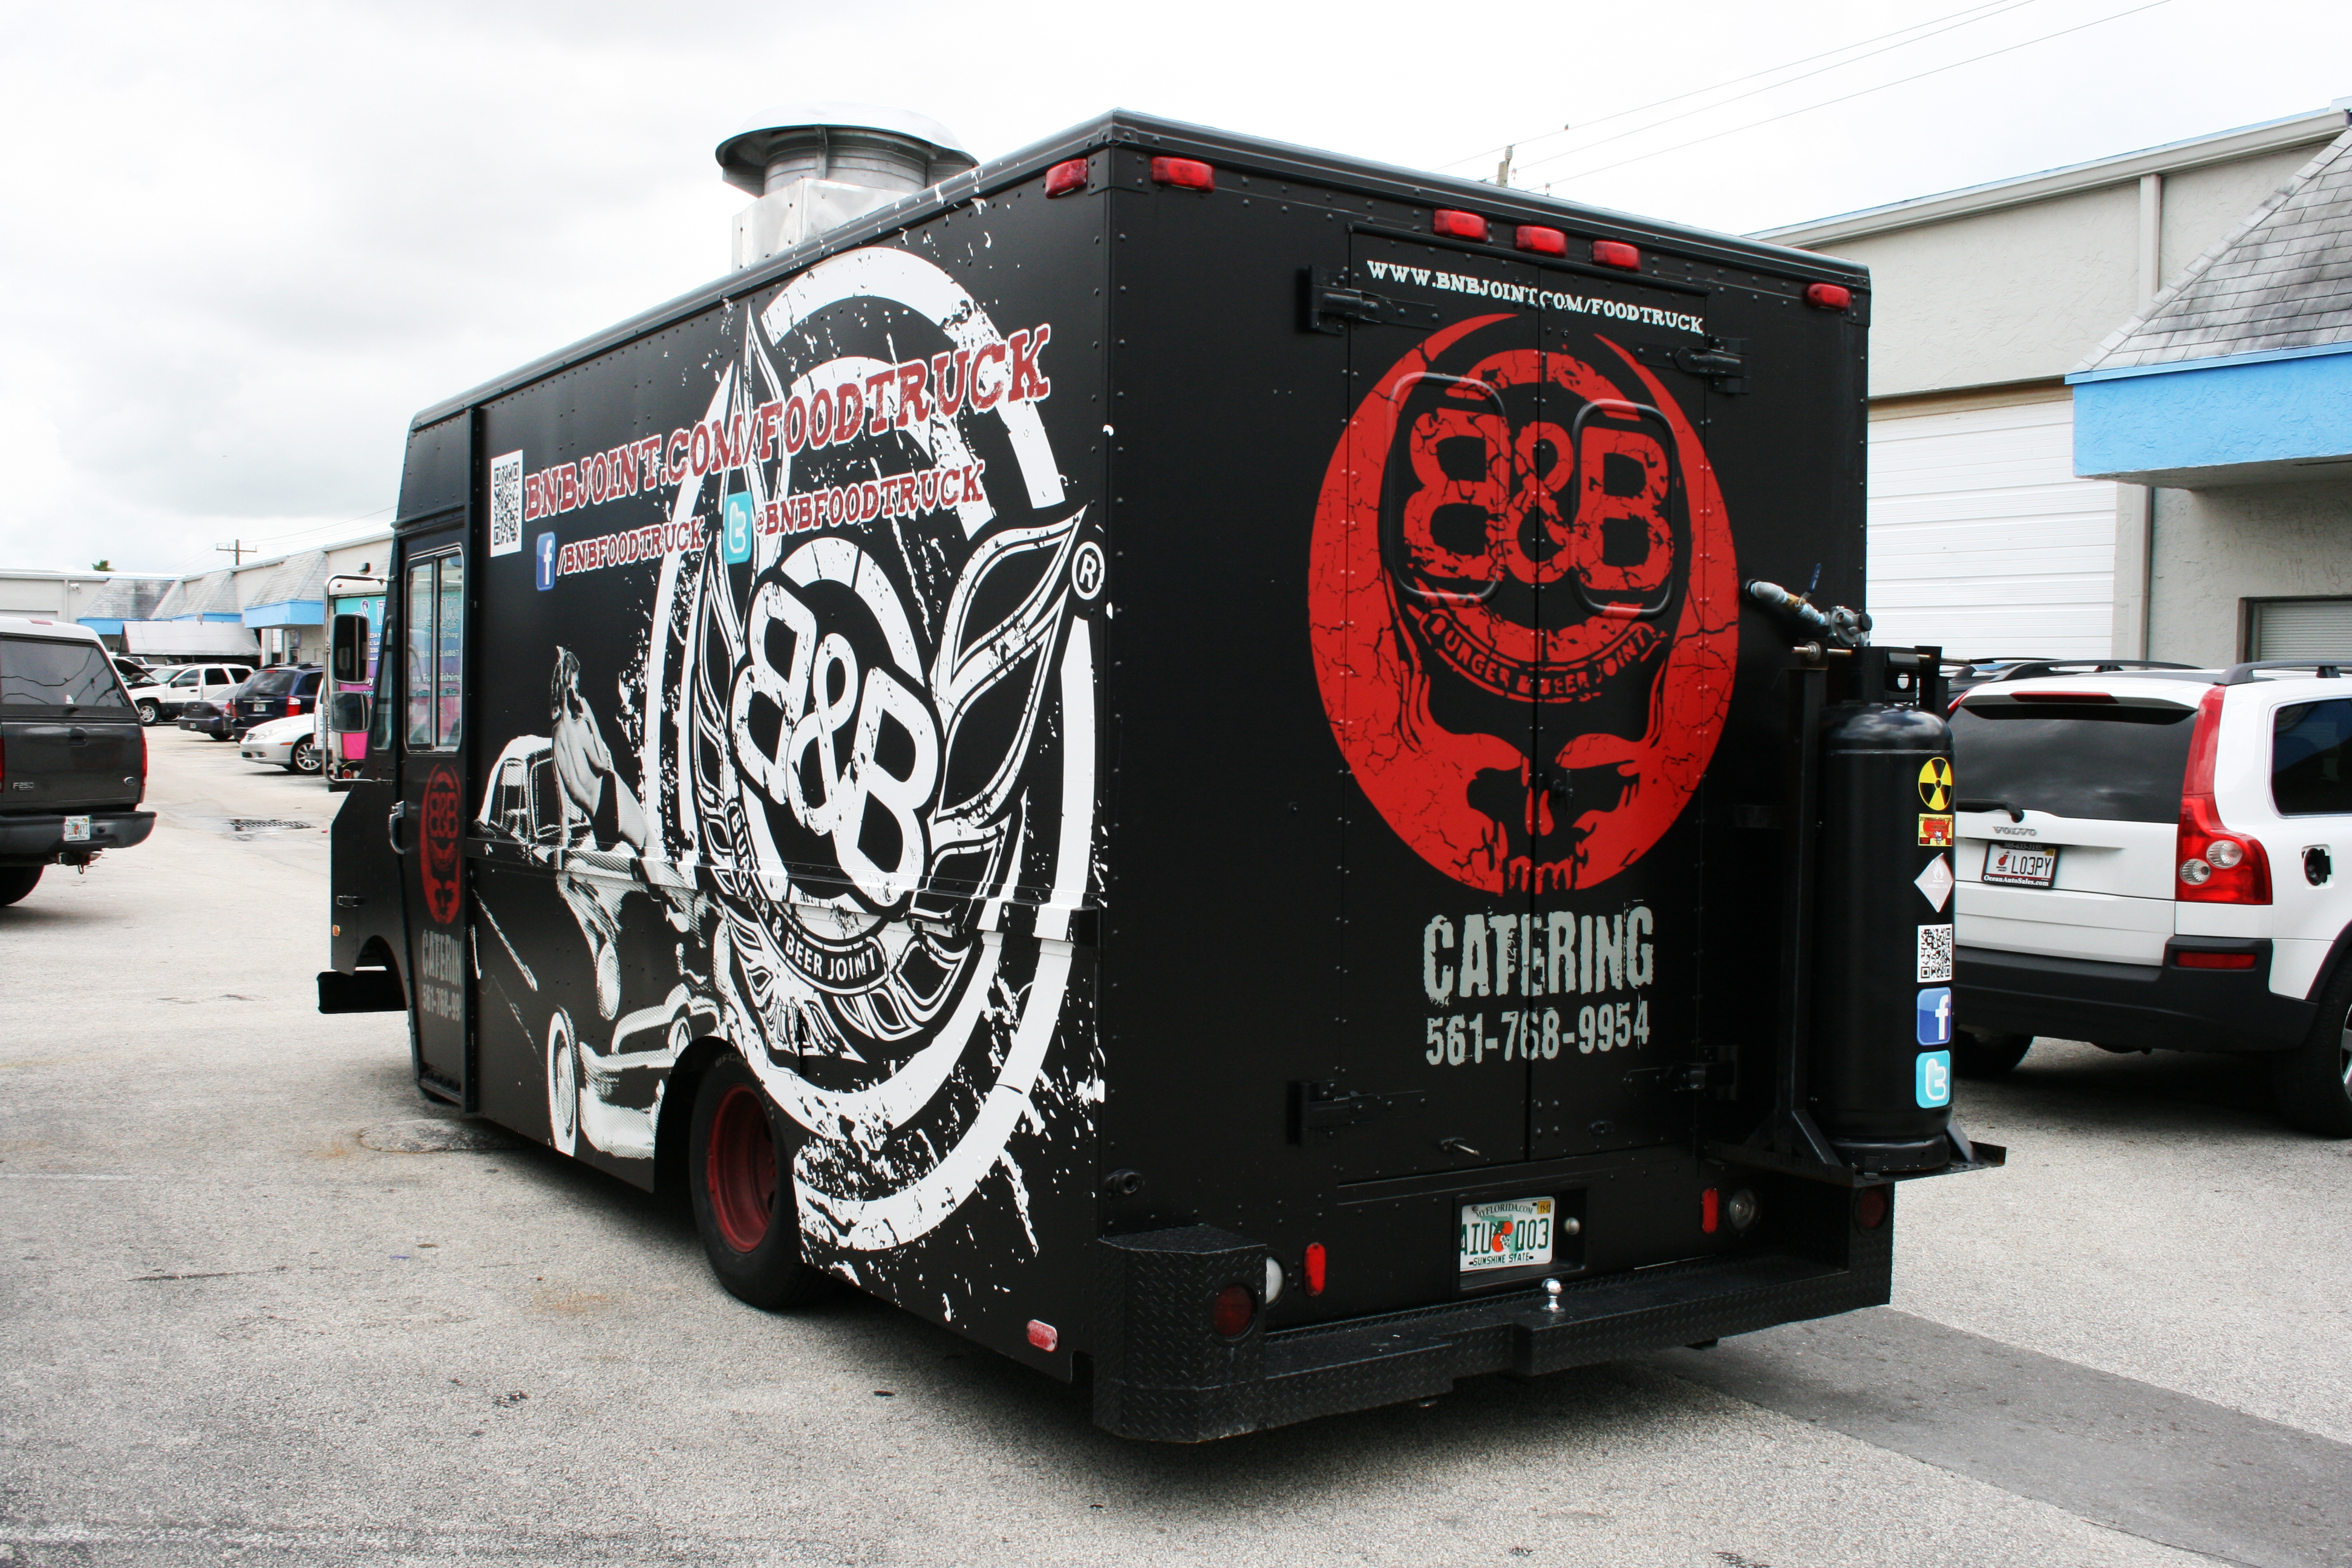 Miami Beer Food Truck